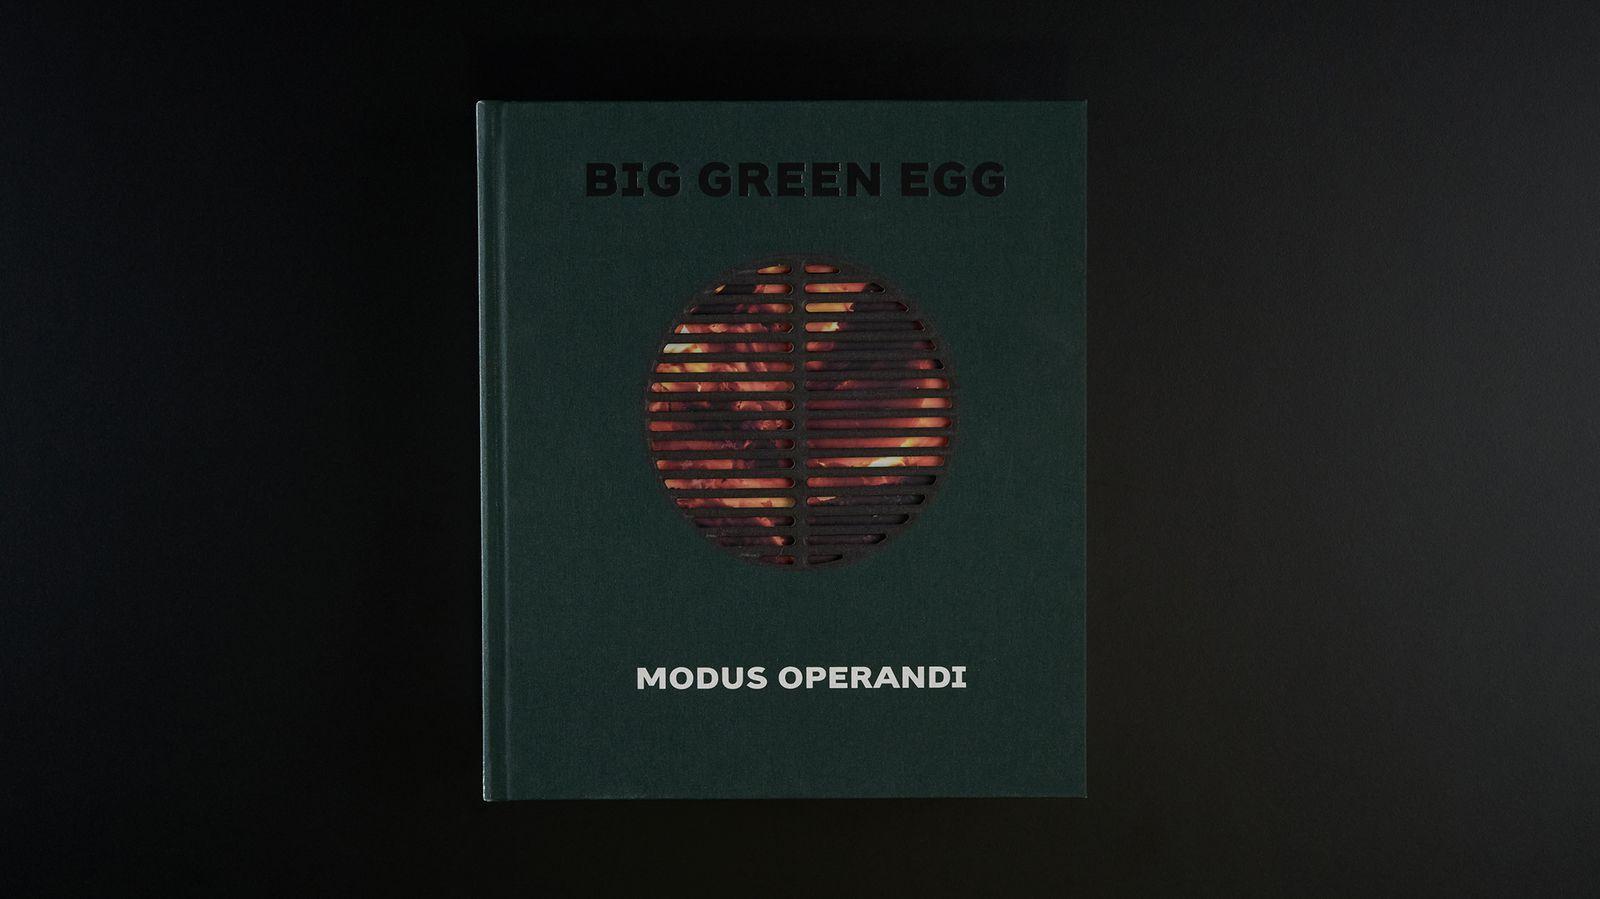 Modus Operandi, Big Green Egg - Cover.jpg